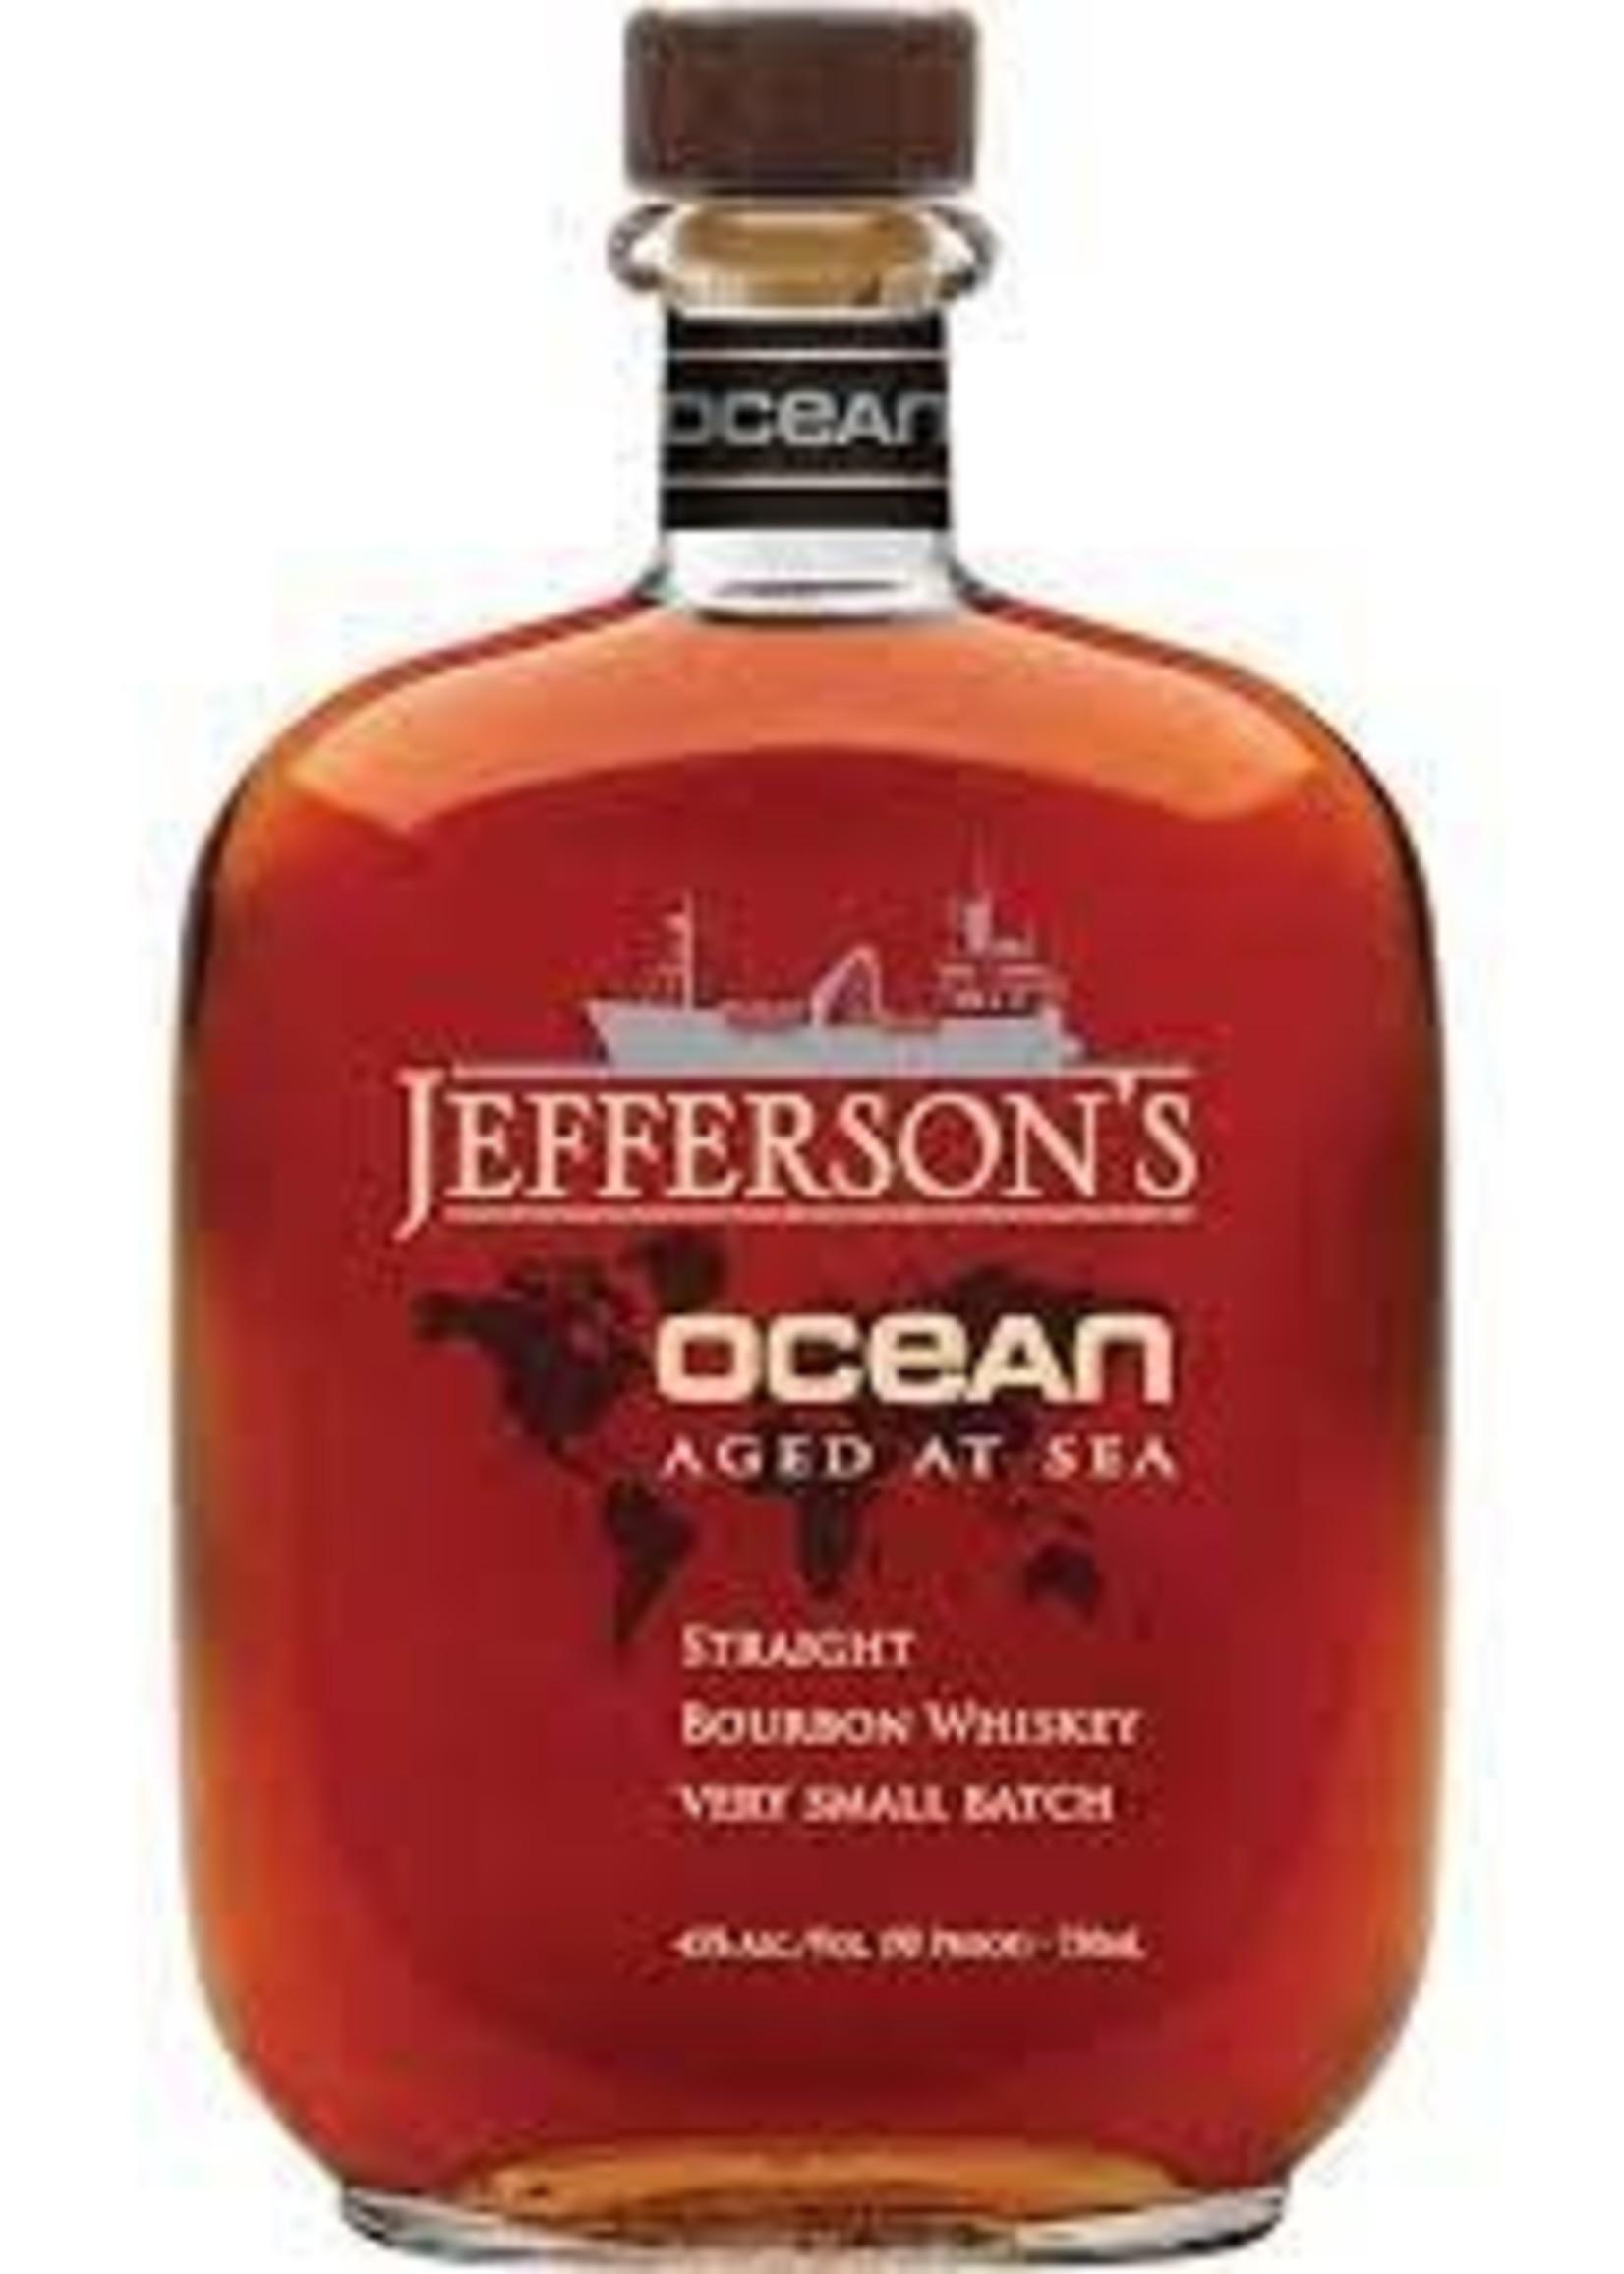 Jefferson's Ocean Aged at Sea Bourbon 750ml